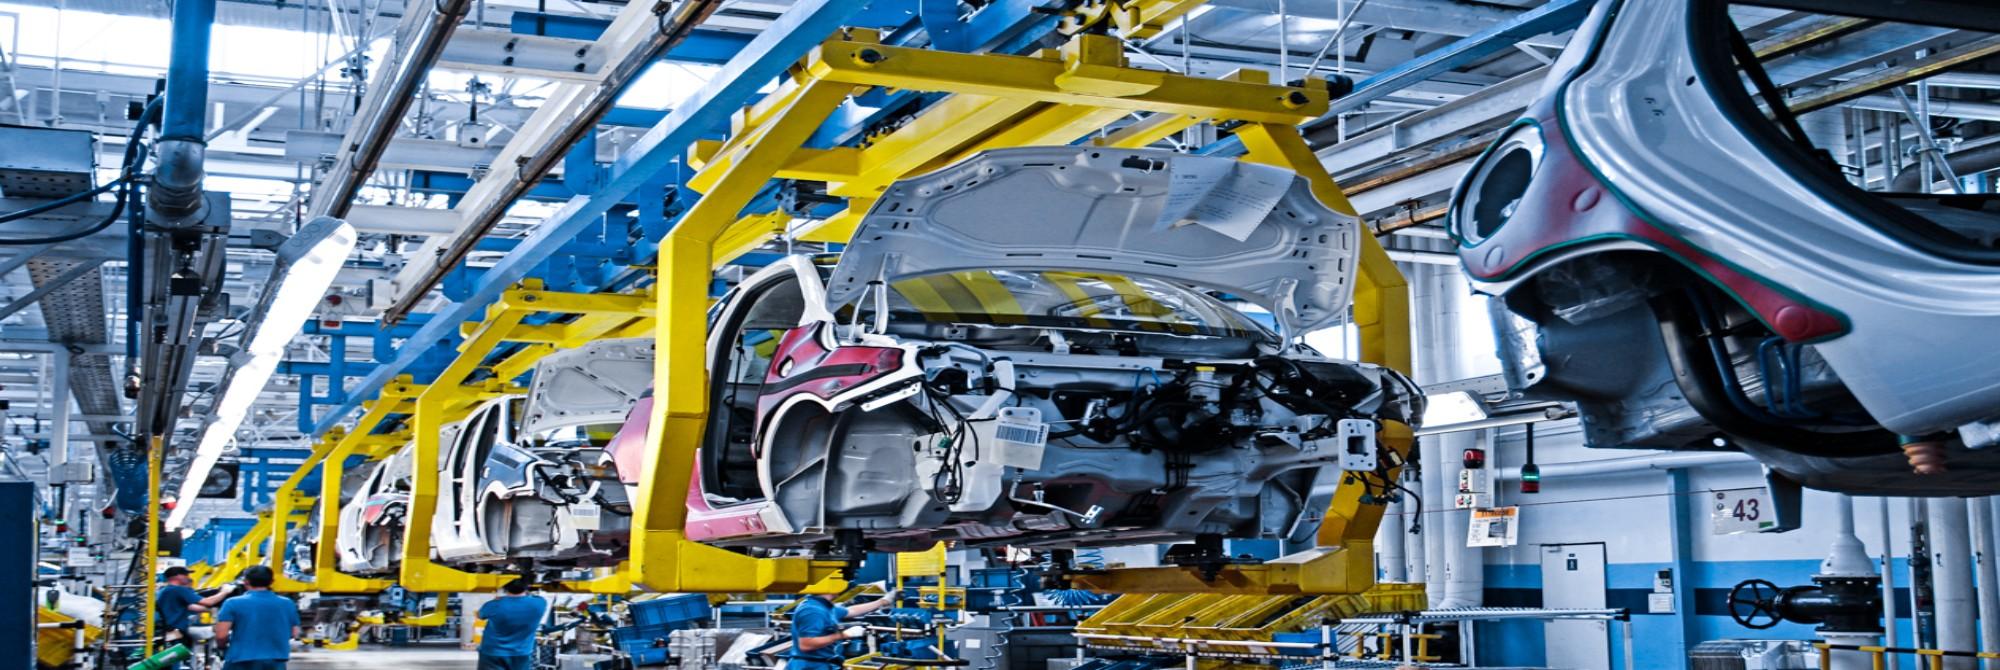 automotive industry thyssenkrupp materials na